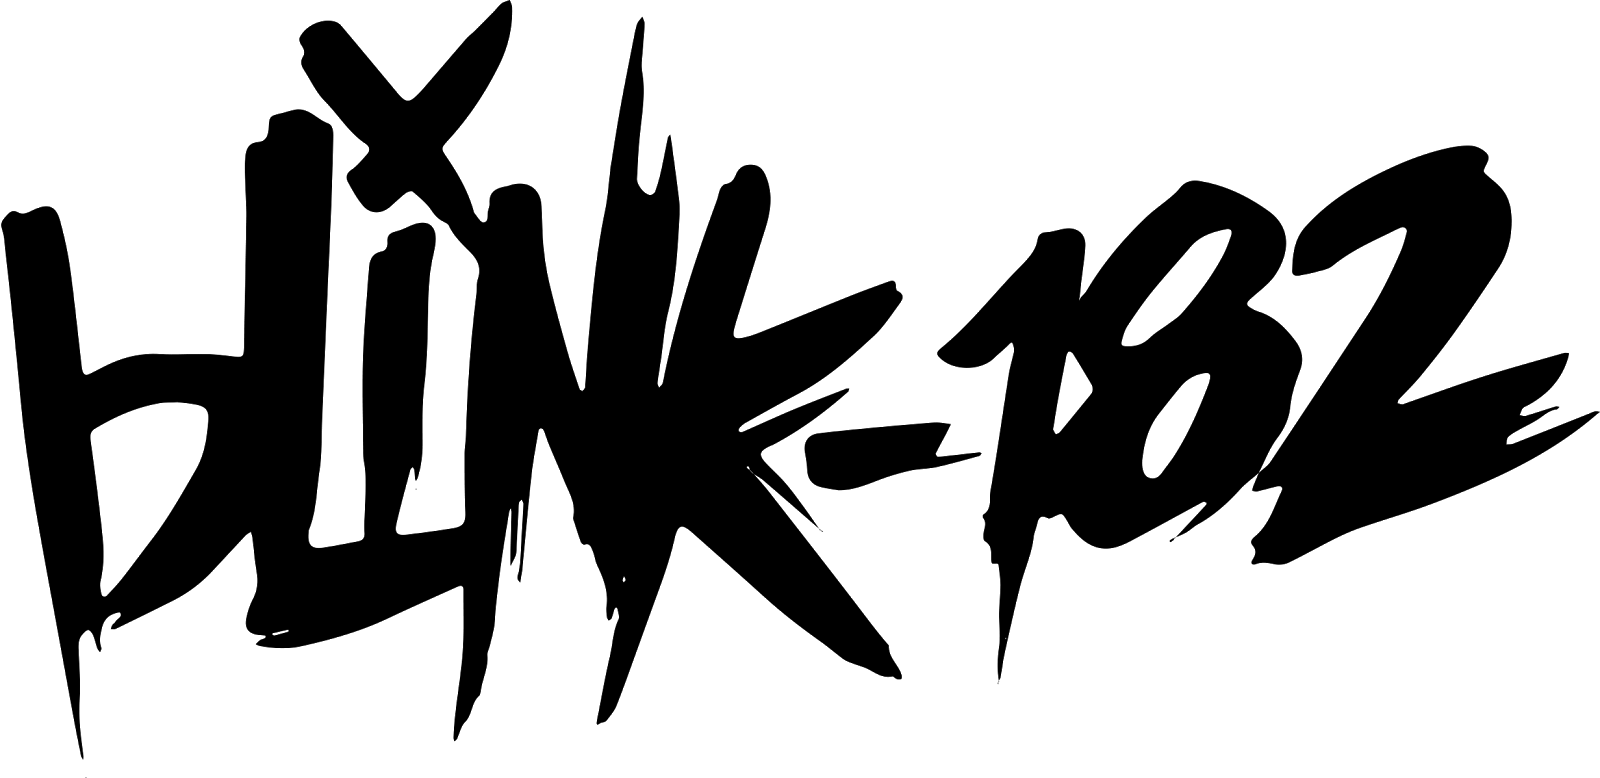 The animals band logo scorpions band logo - Blink 182 Logo Preto E Branco Pesquisa Google